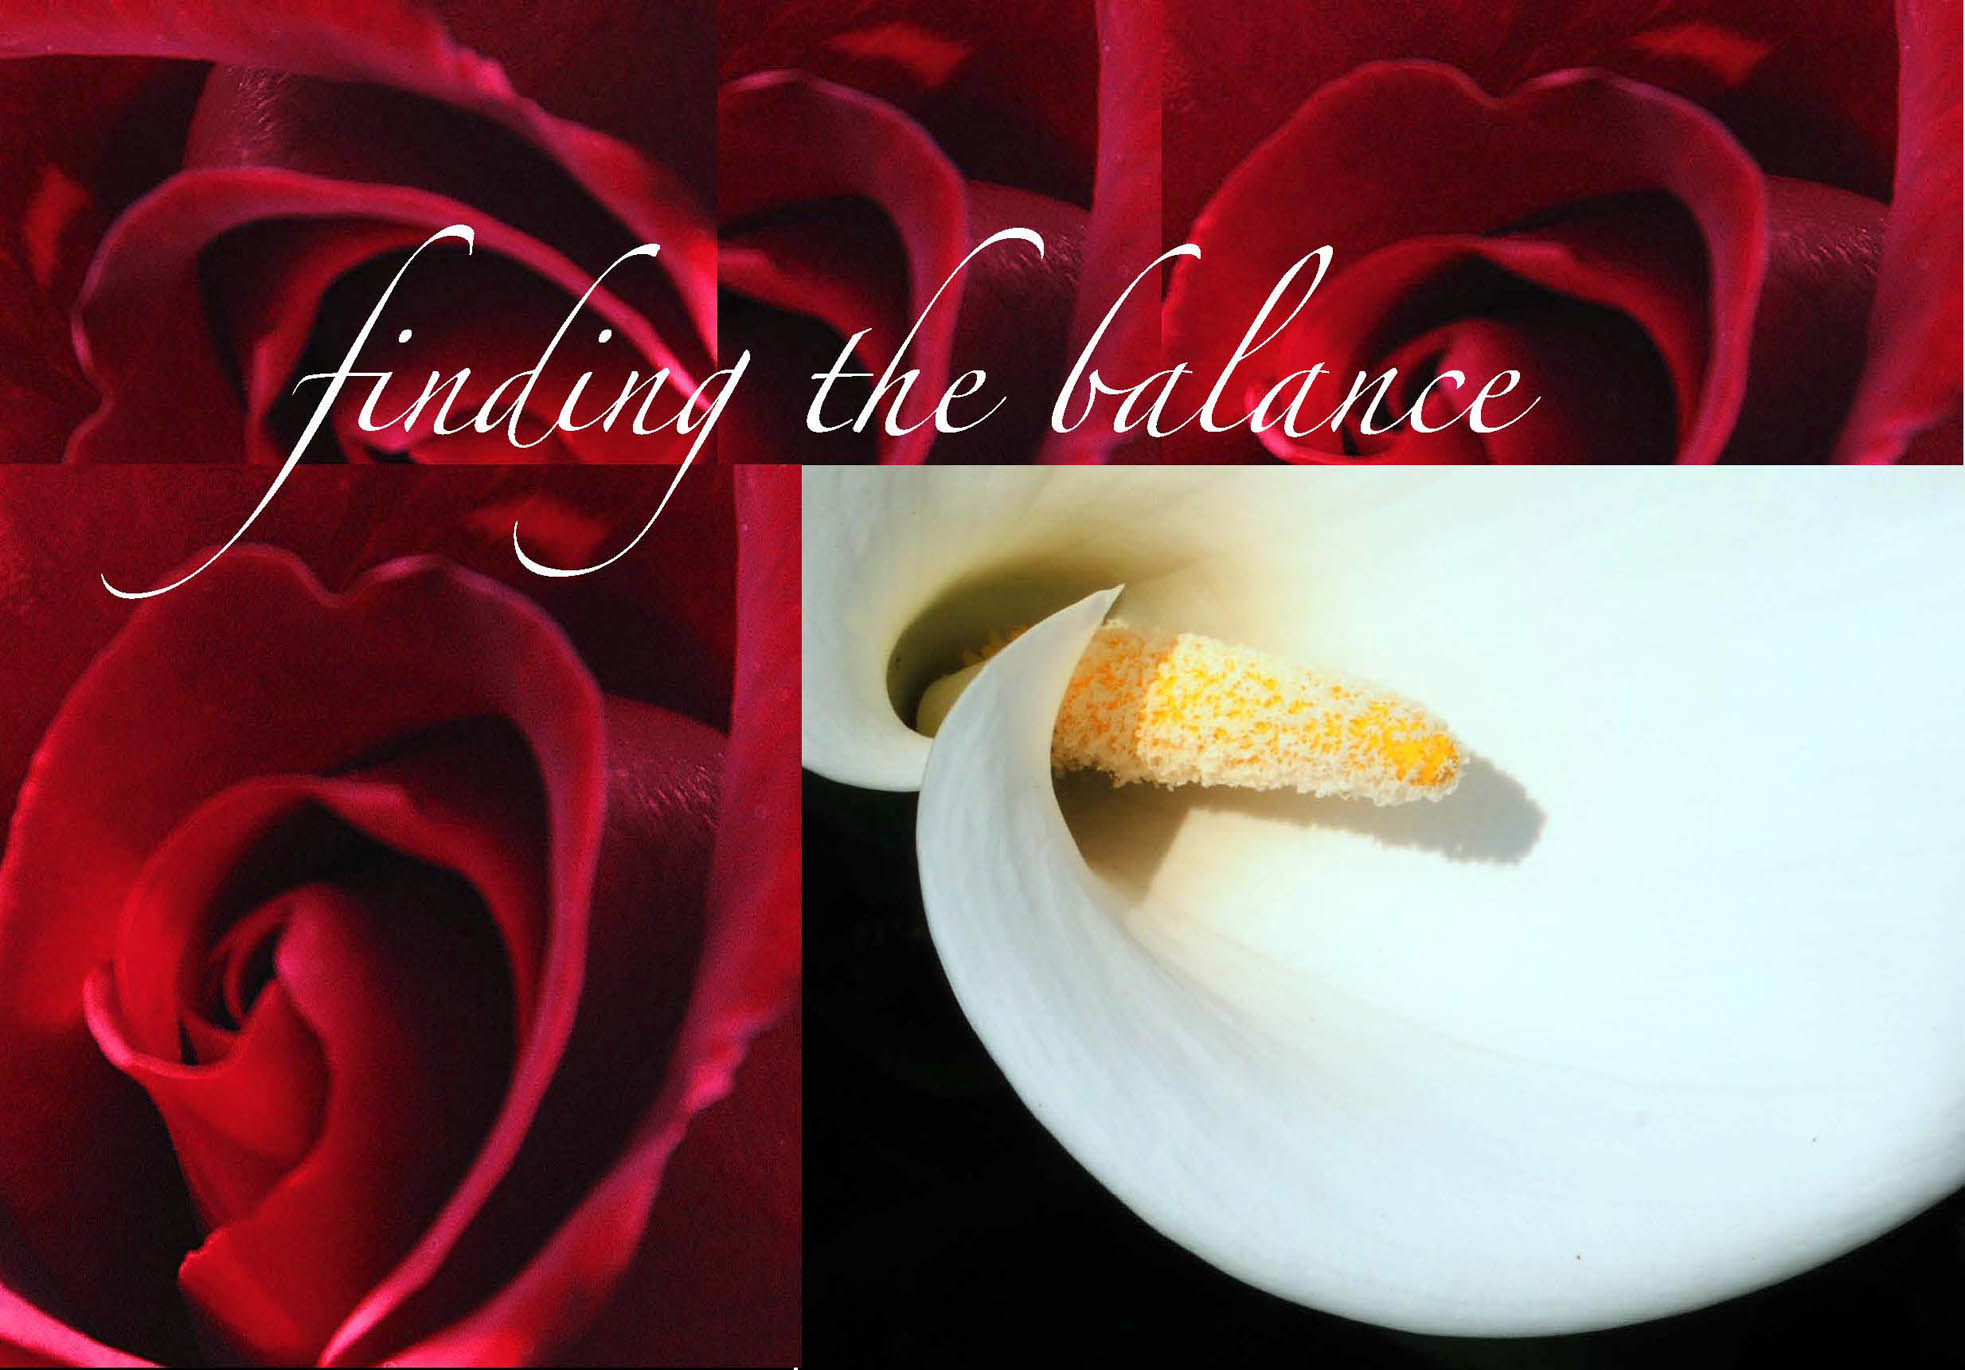 finding-the-balance-glastonbuy-copy